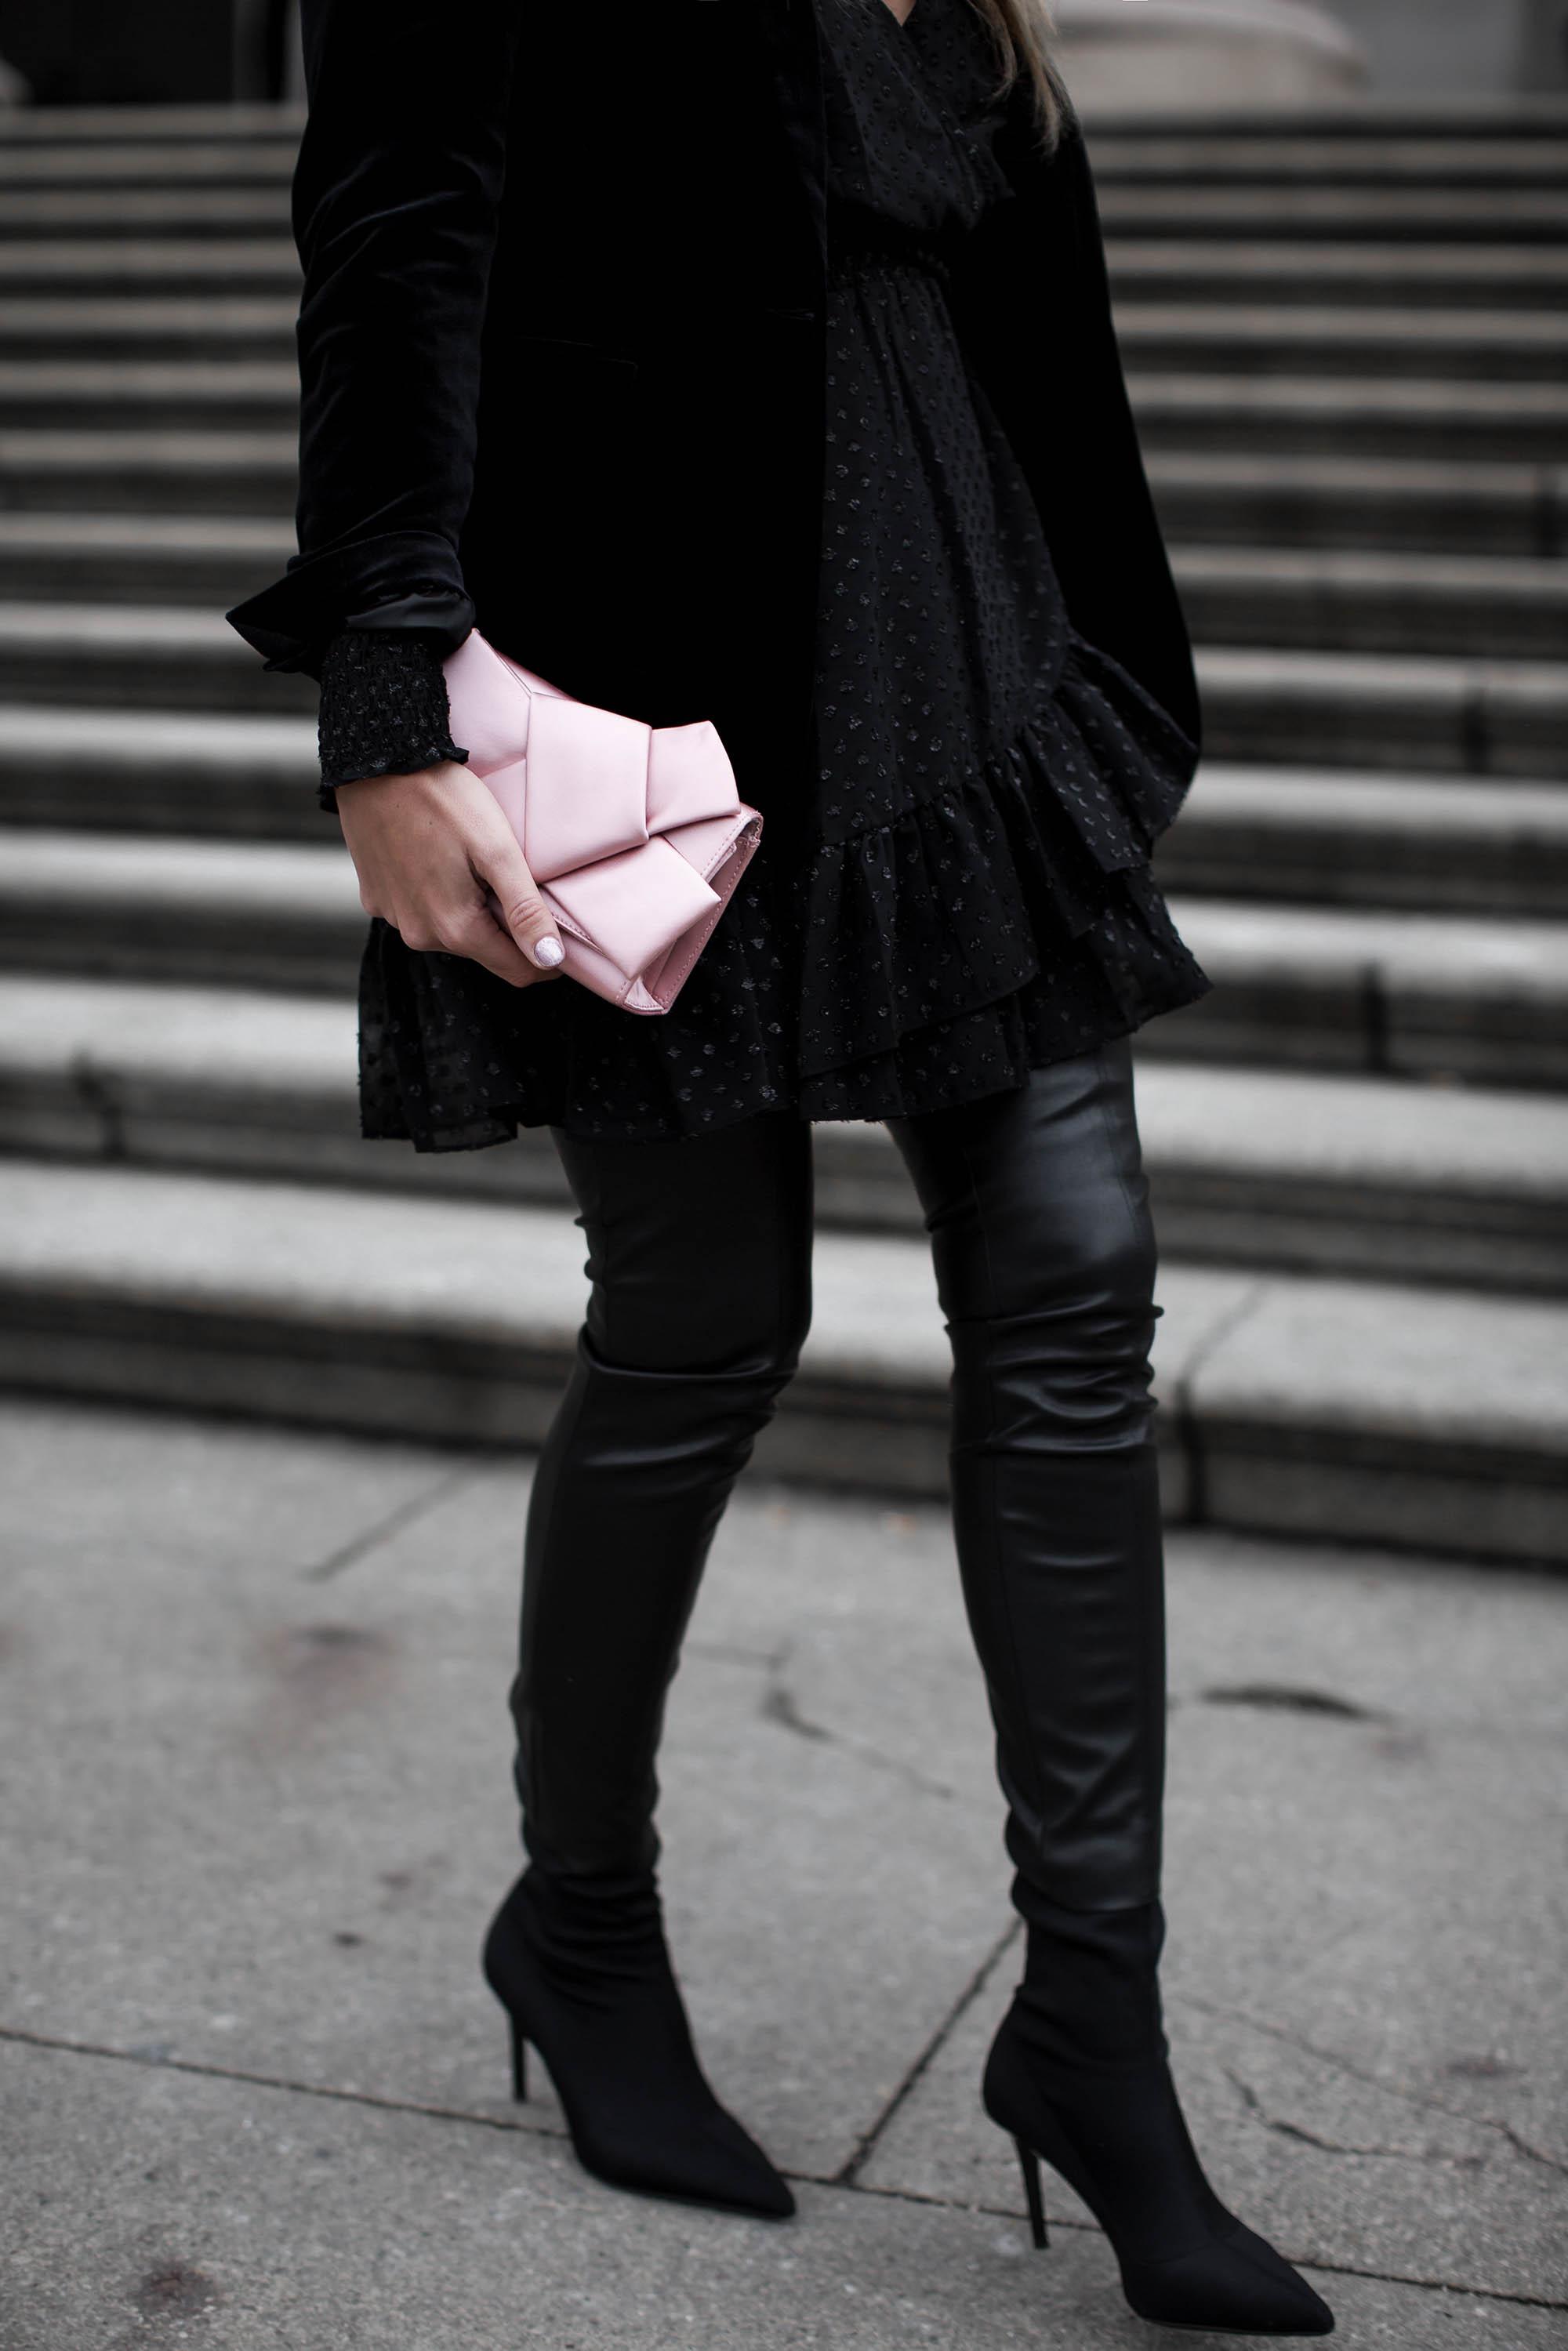 black-palms-festive-outfit-peekcloppenburg-festlicher-look-fashionblog-6